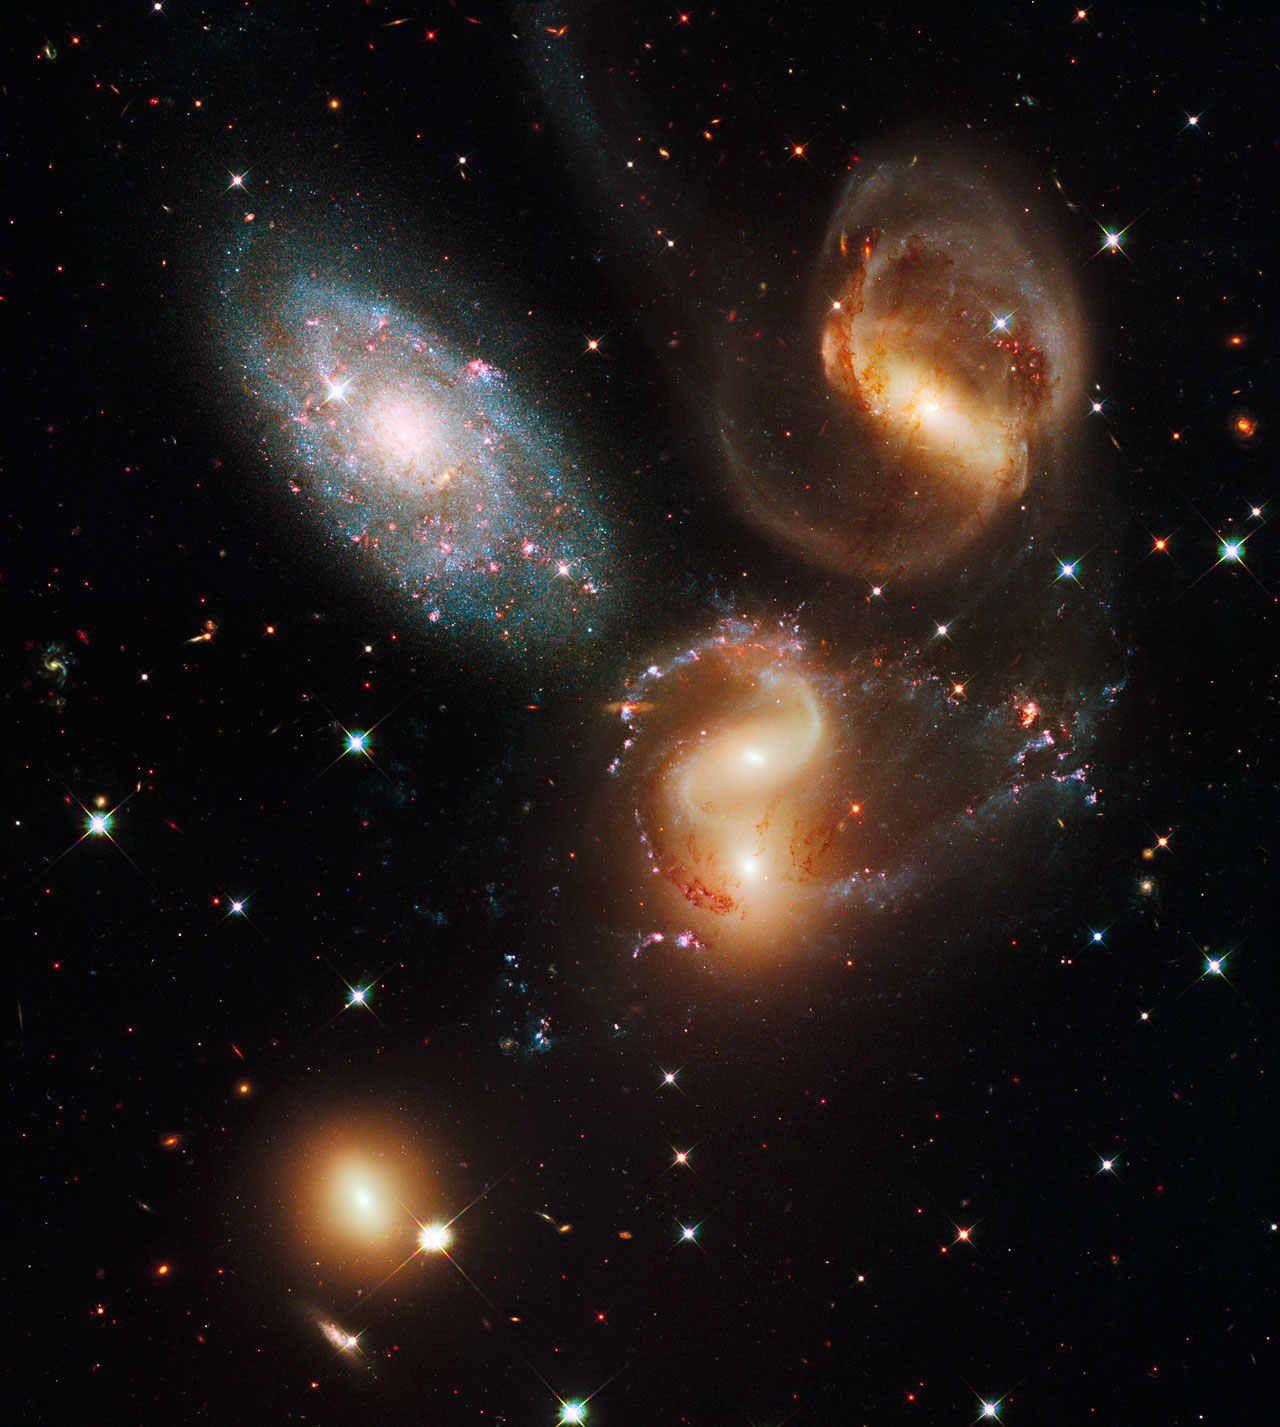 Stephan's Quintet photographed by the Hubble space telescope. Credit: NASA, ESA, Hubble SM4 ERO Team